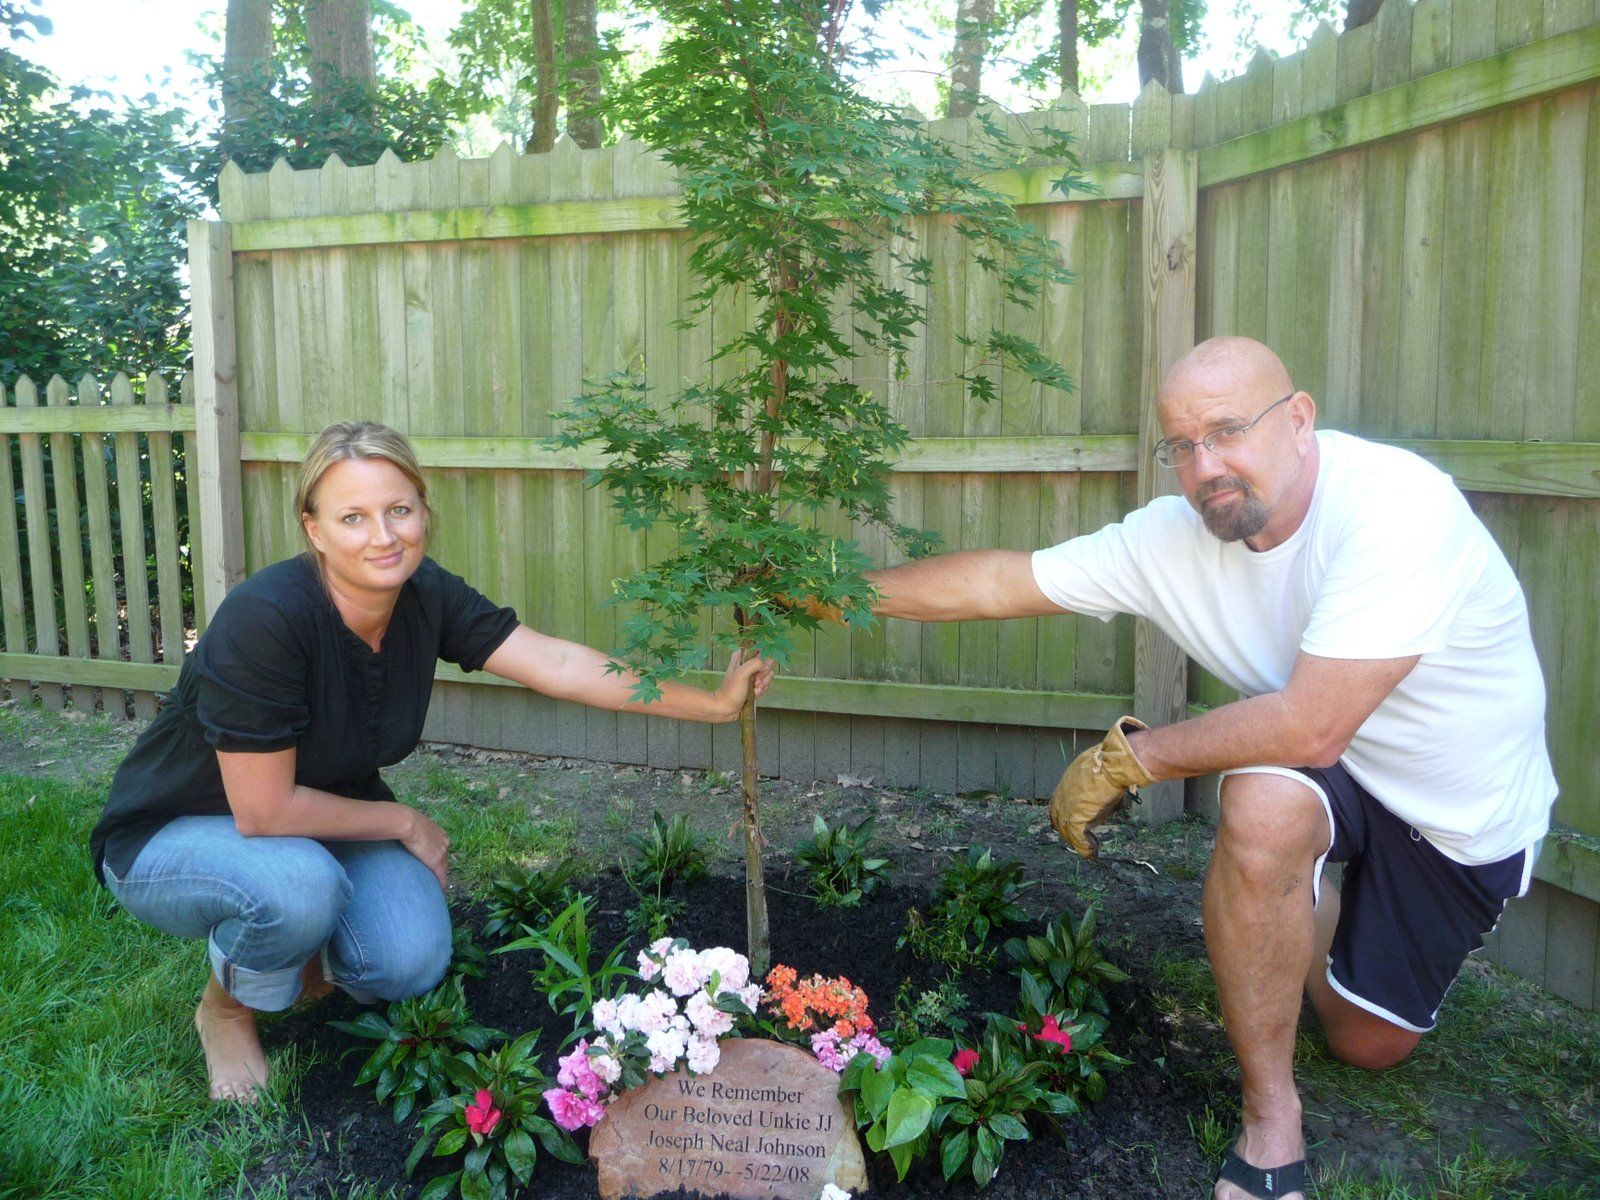 Memorial Garden Ideas Google Search ❦ Remembering Ryan